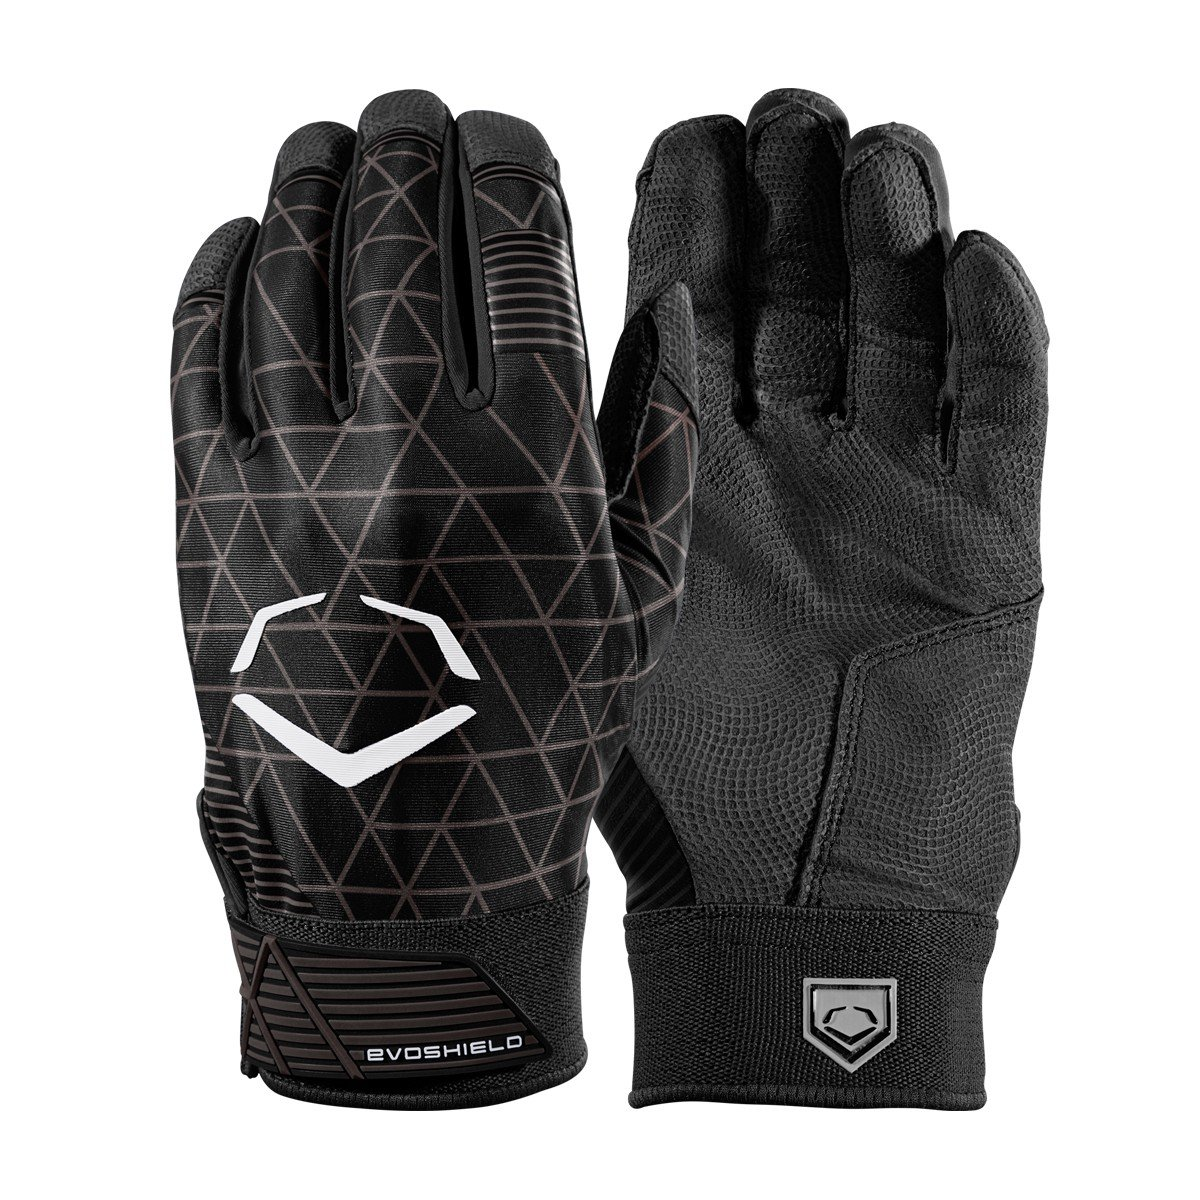 Evoshield evocharge保護用バッティング手袋 B0741JK72V Large|ブラック|ユース ブラック Large